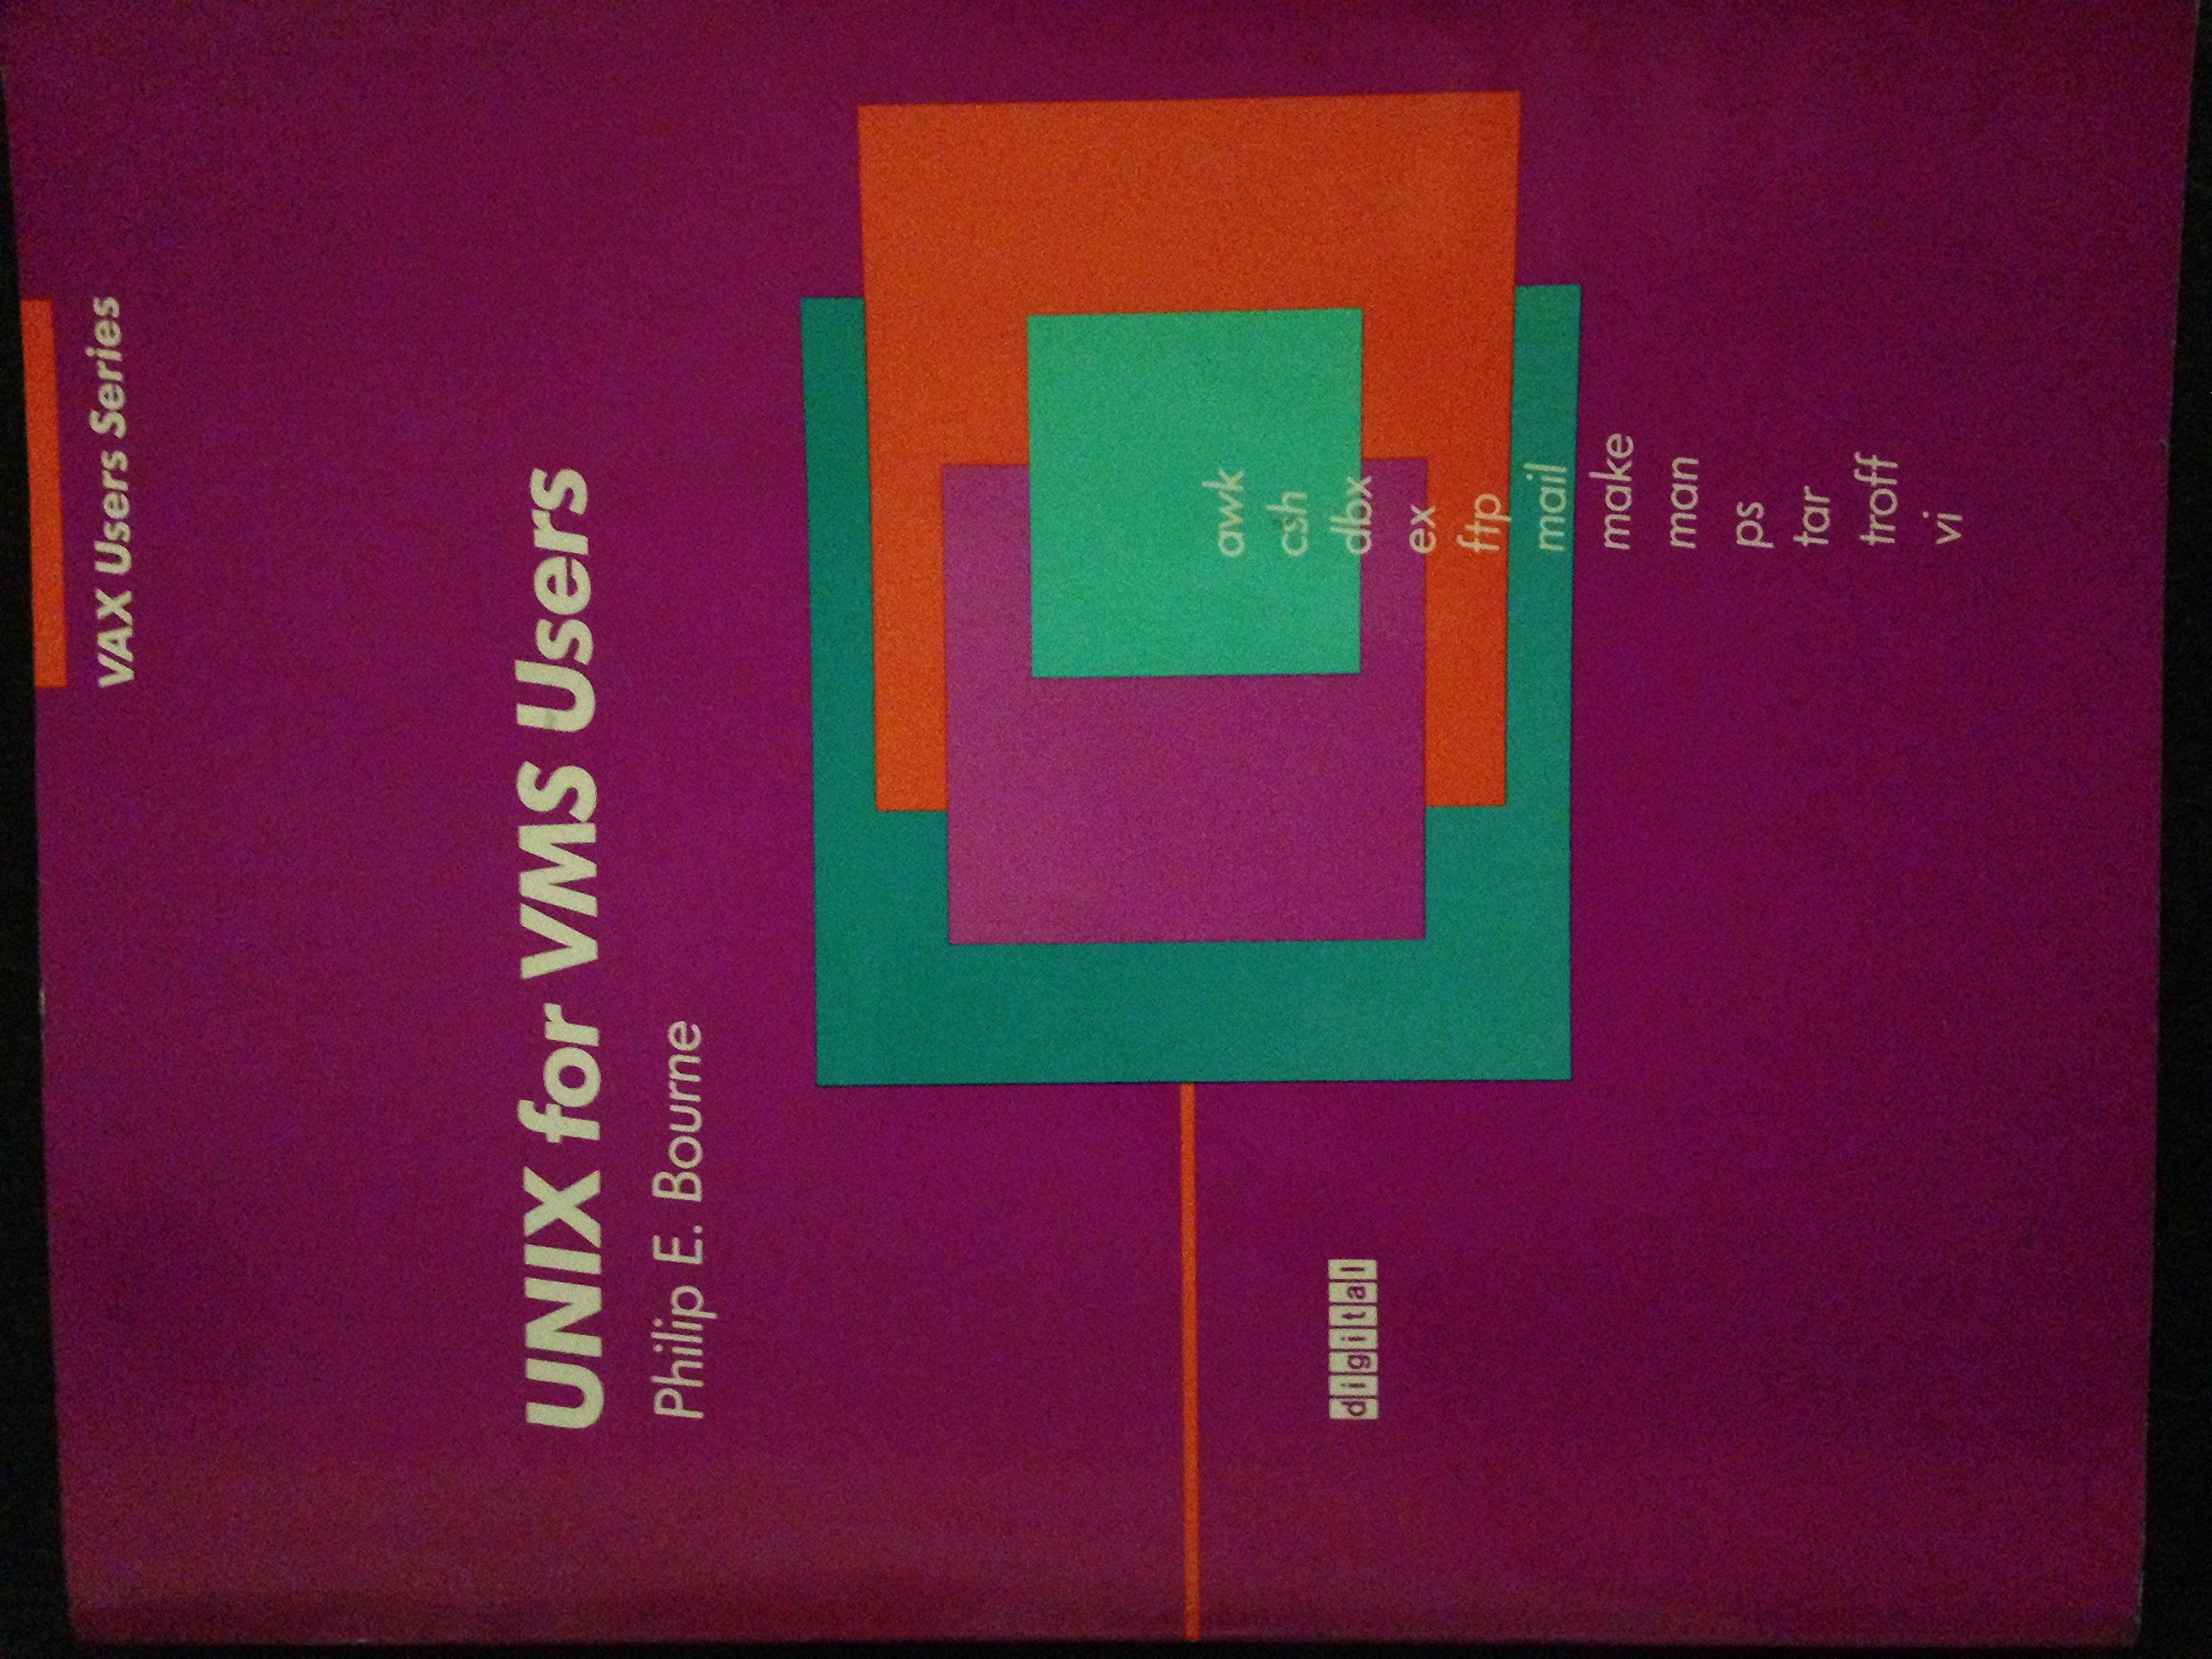 Unix for Vms Users (Digital press vax users series): Amazon